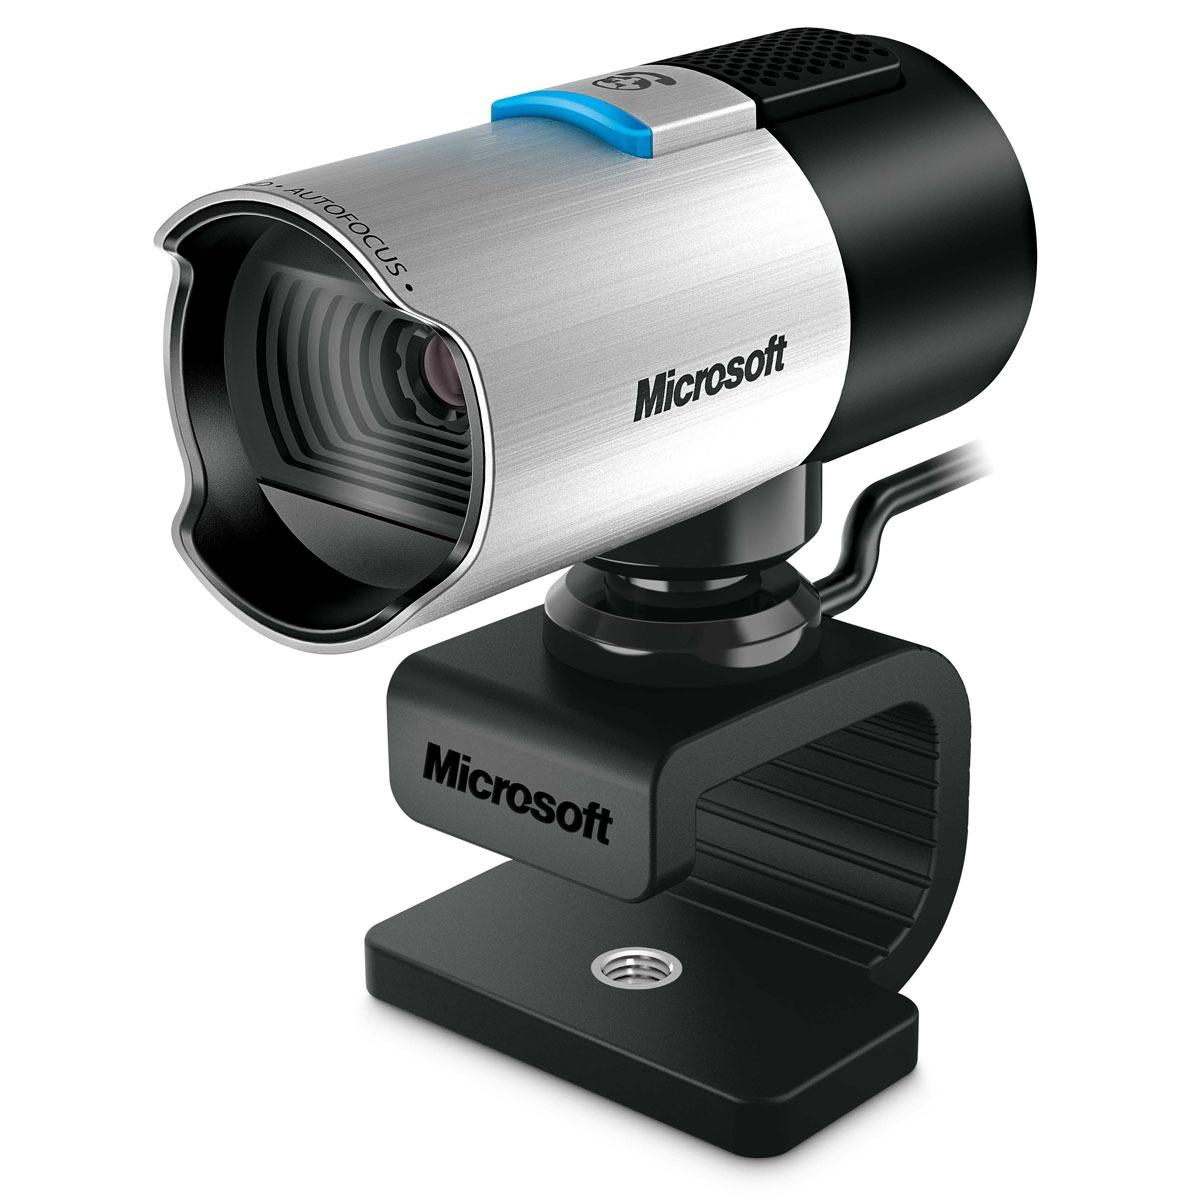 Webcam Microsoft LifeCam Studio Microsoft LifeCam Studio - Webcam Full HD 1080p